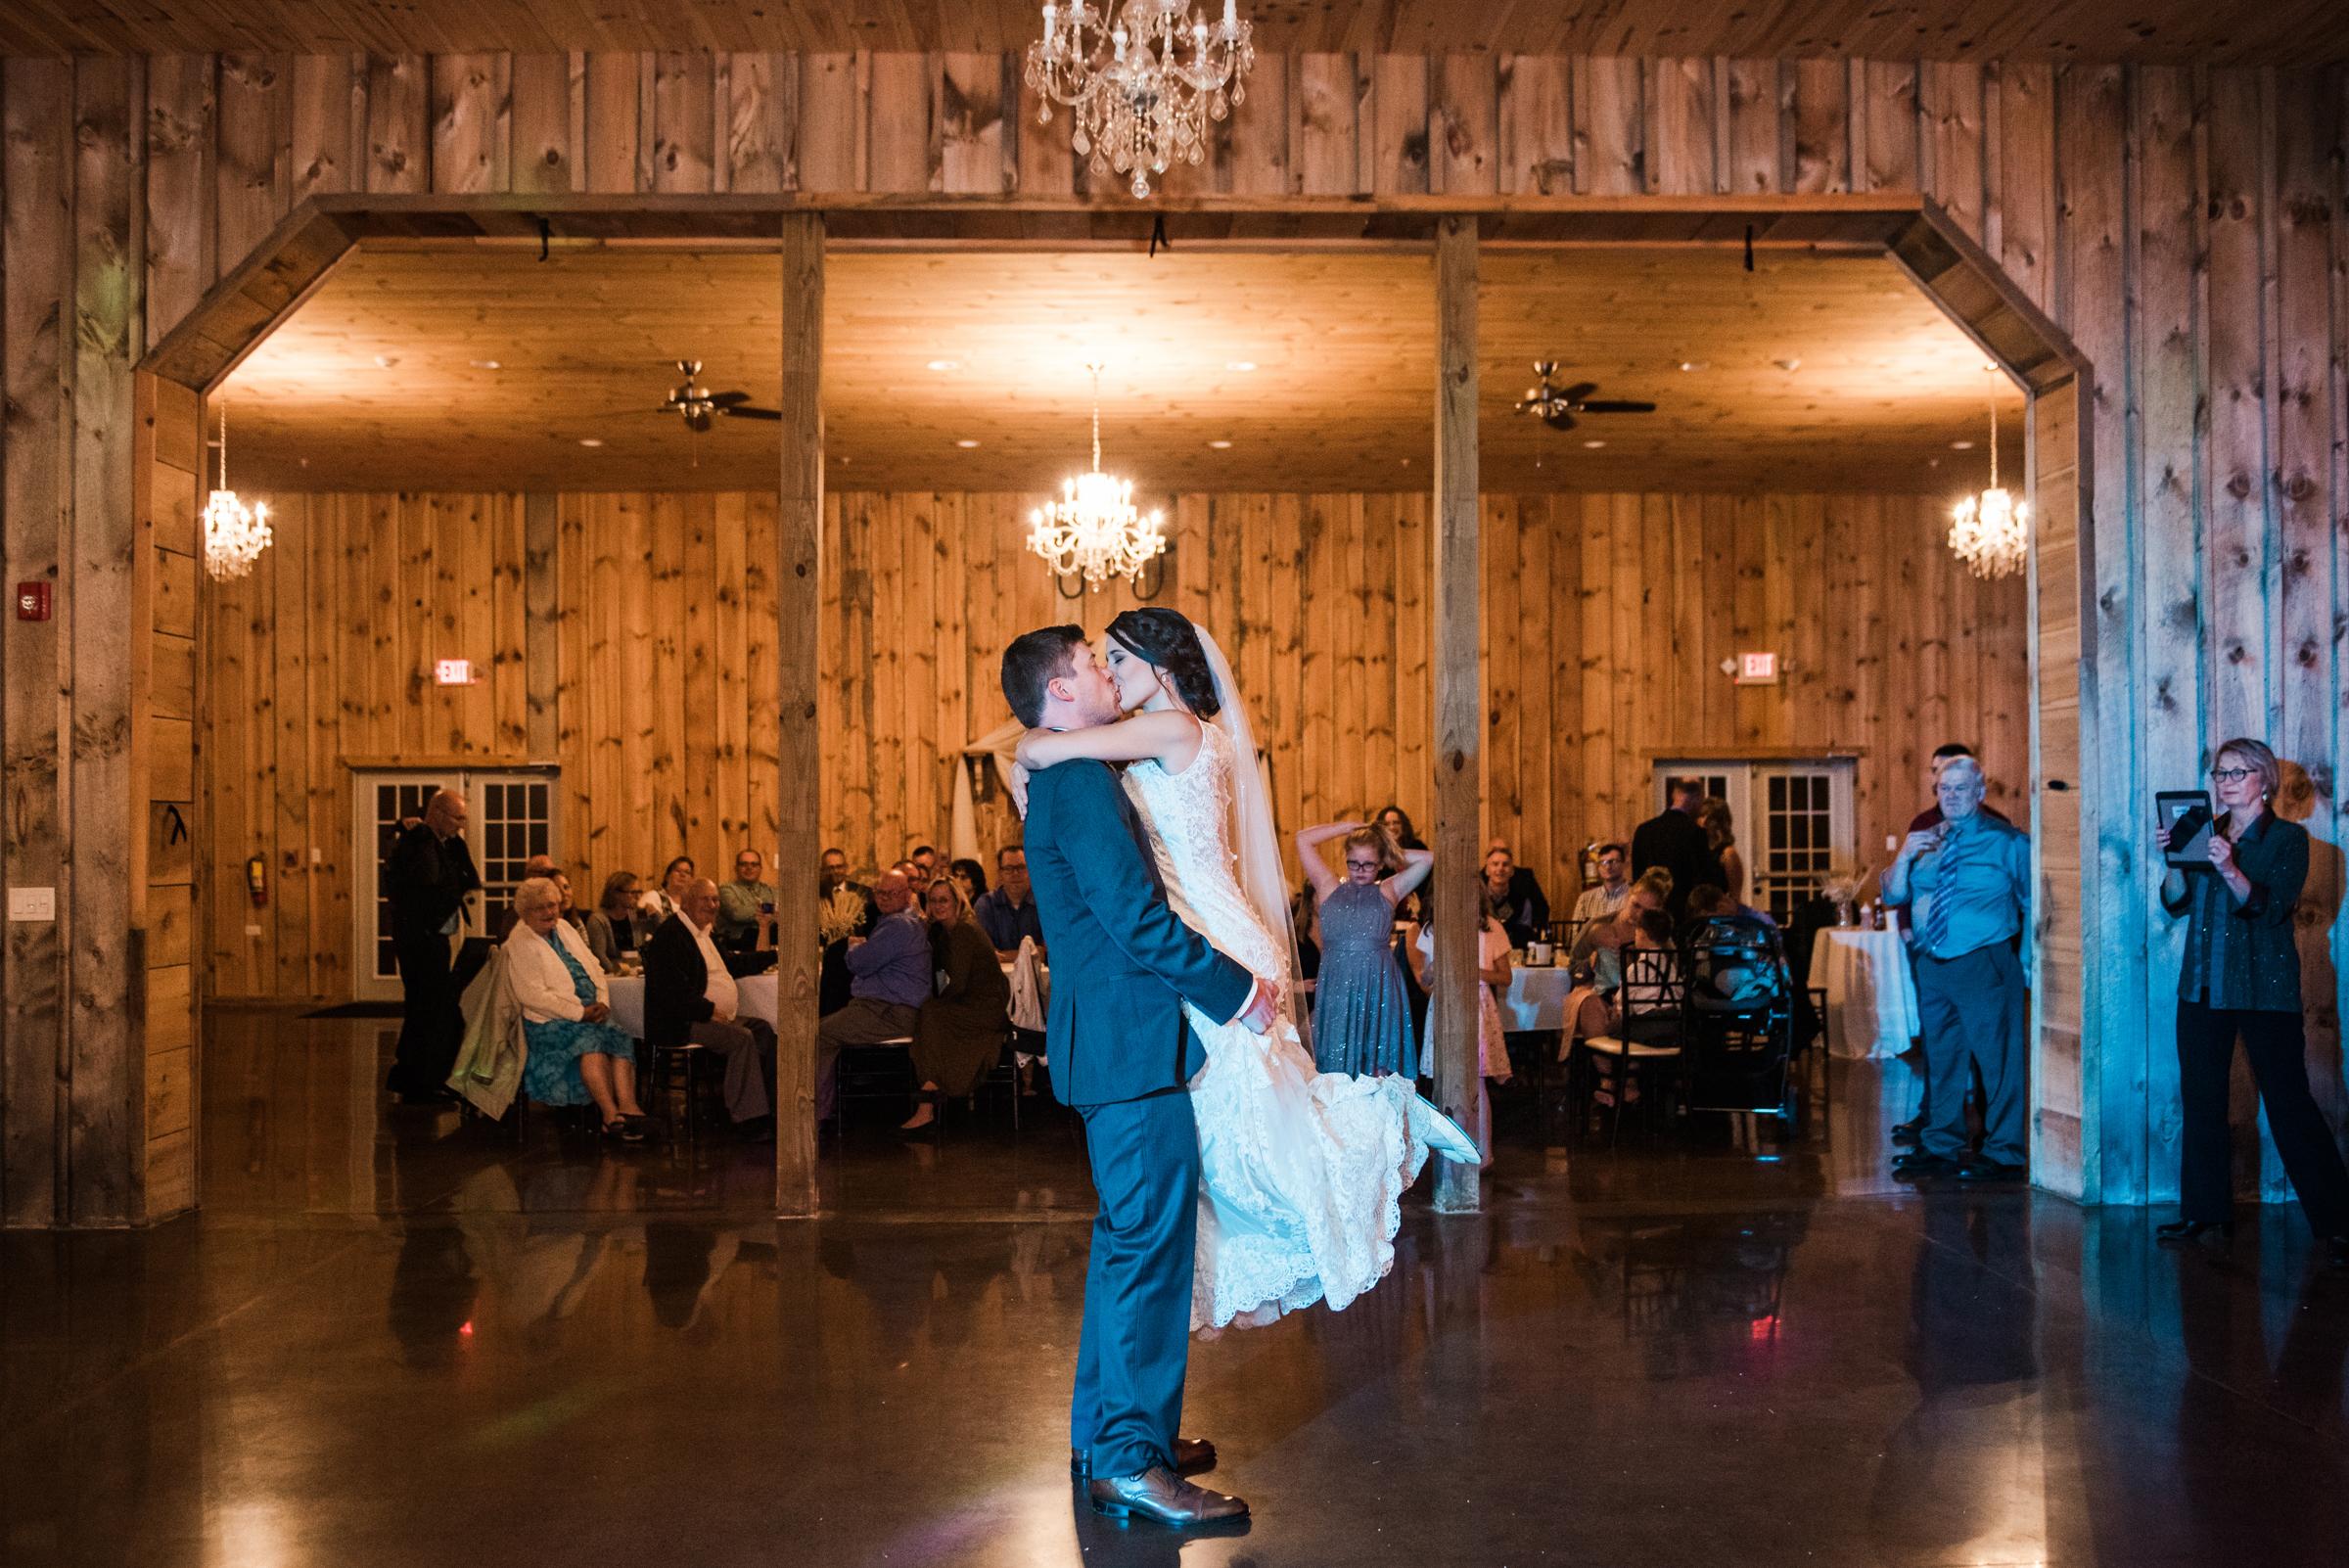 Wolf_Oak_Acres_Central_NY_Wedding_JILL_STUDIO_Rochester_NY_Photographer_DSC_8056.jpg